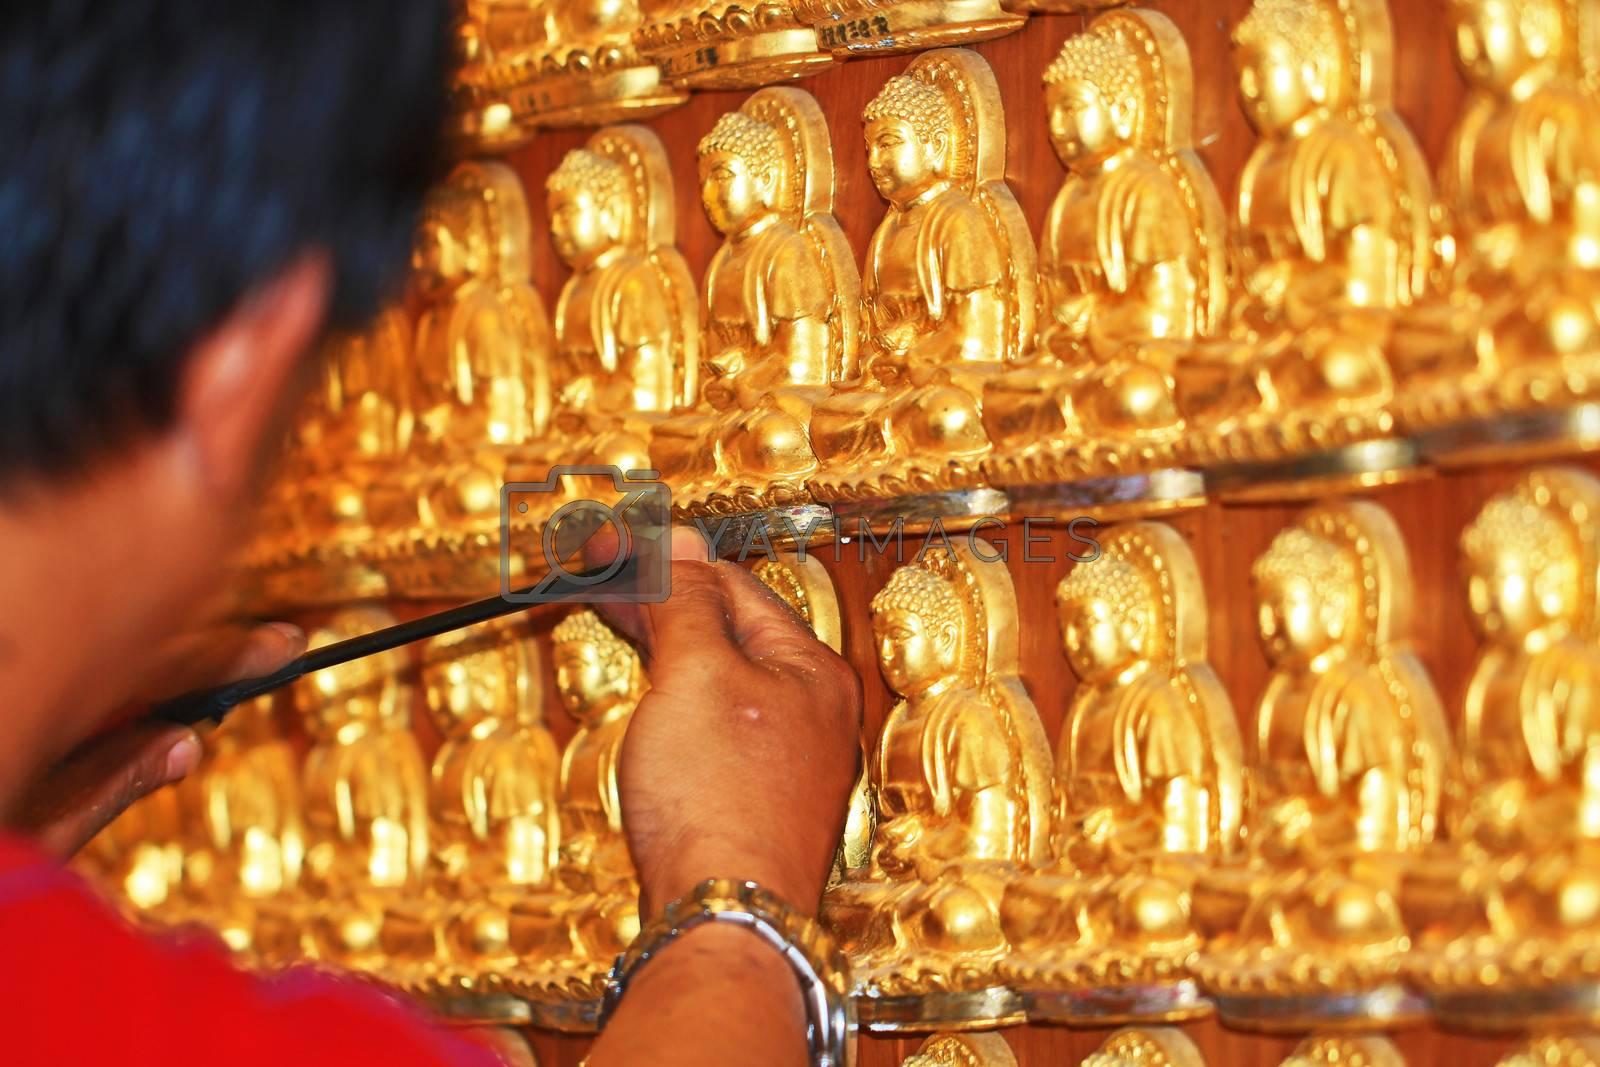 Mahayana buddhist temple wall in Wat-Leng-Noei-Yi 2 at Bang-Bua-Thong.